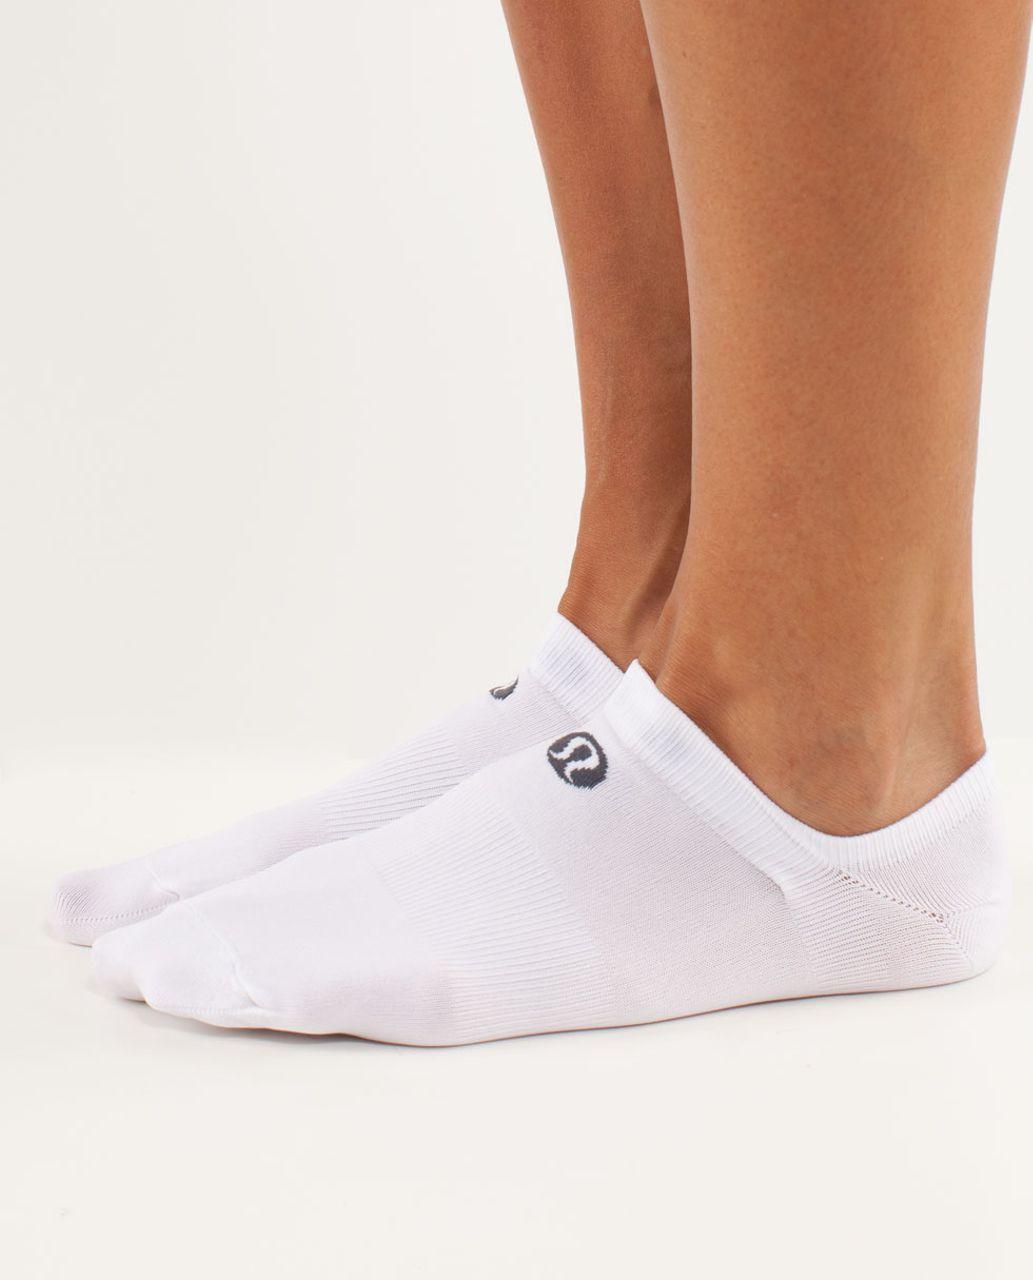 Lululemon Women's Featherweight Sock - White